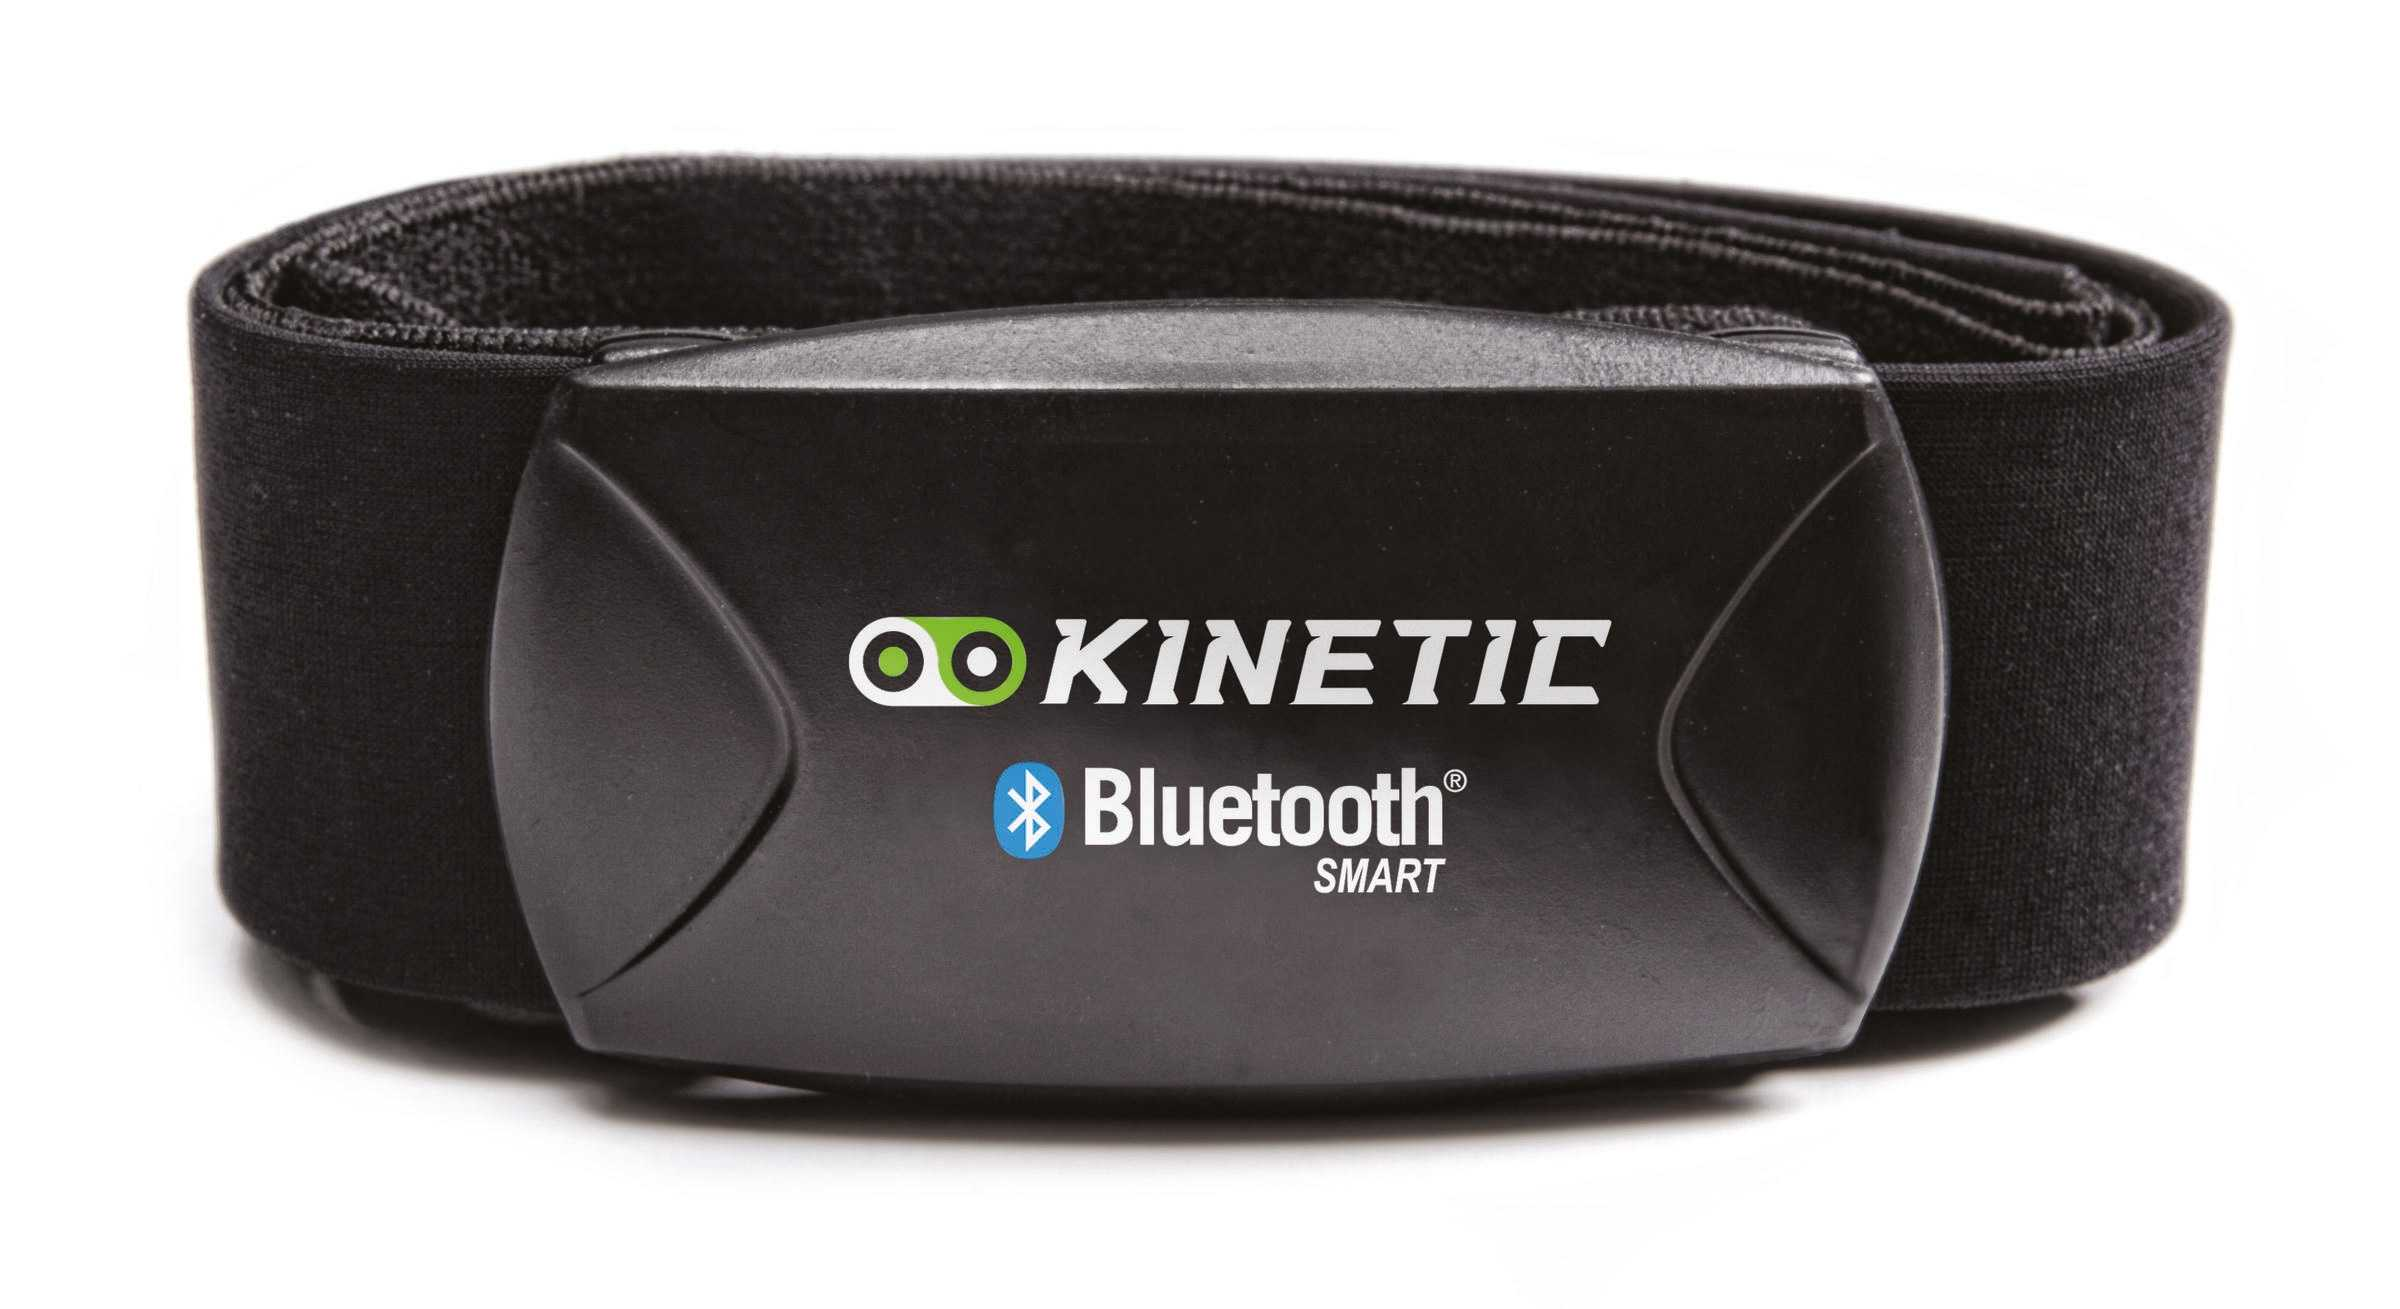 Pulsbånd Kinetic inRide Dual-band HR Strap | Speed cadence sensor